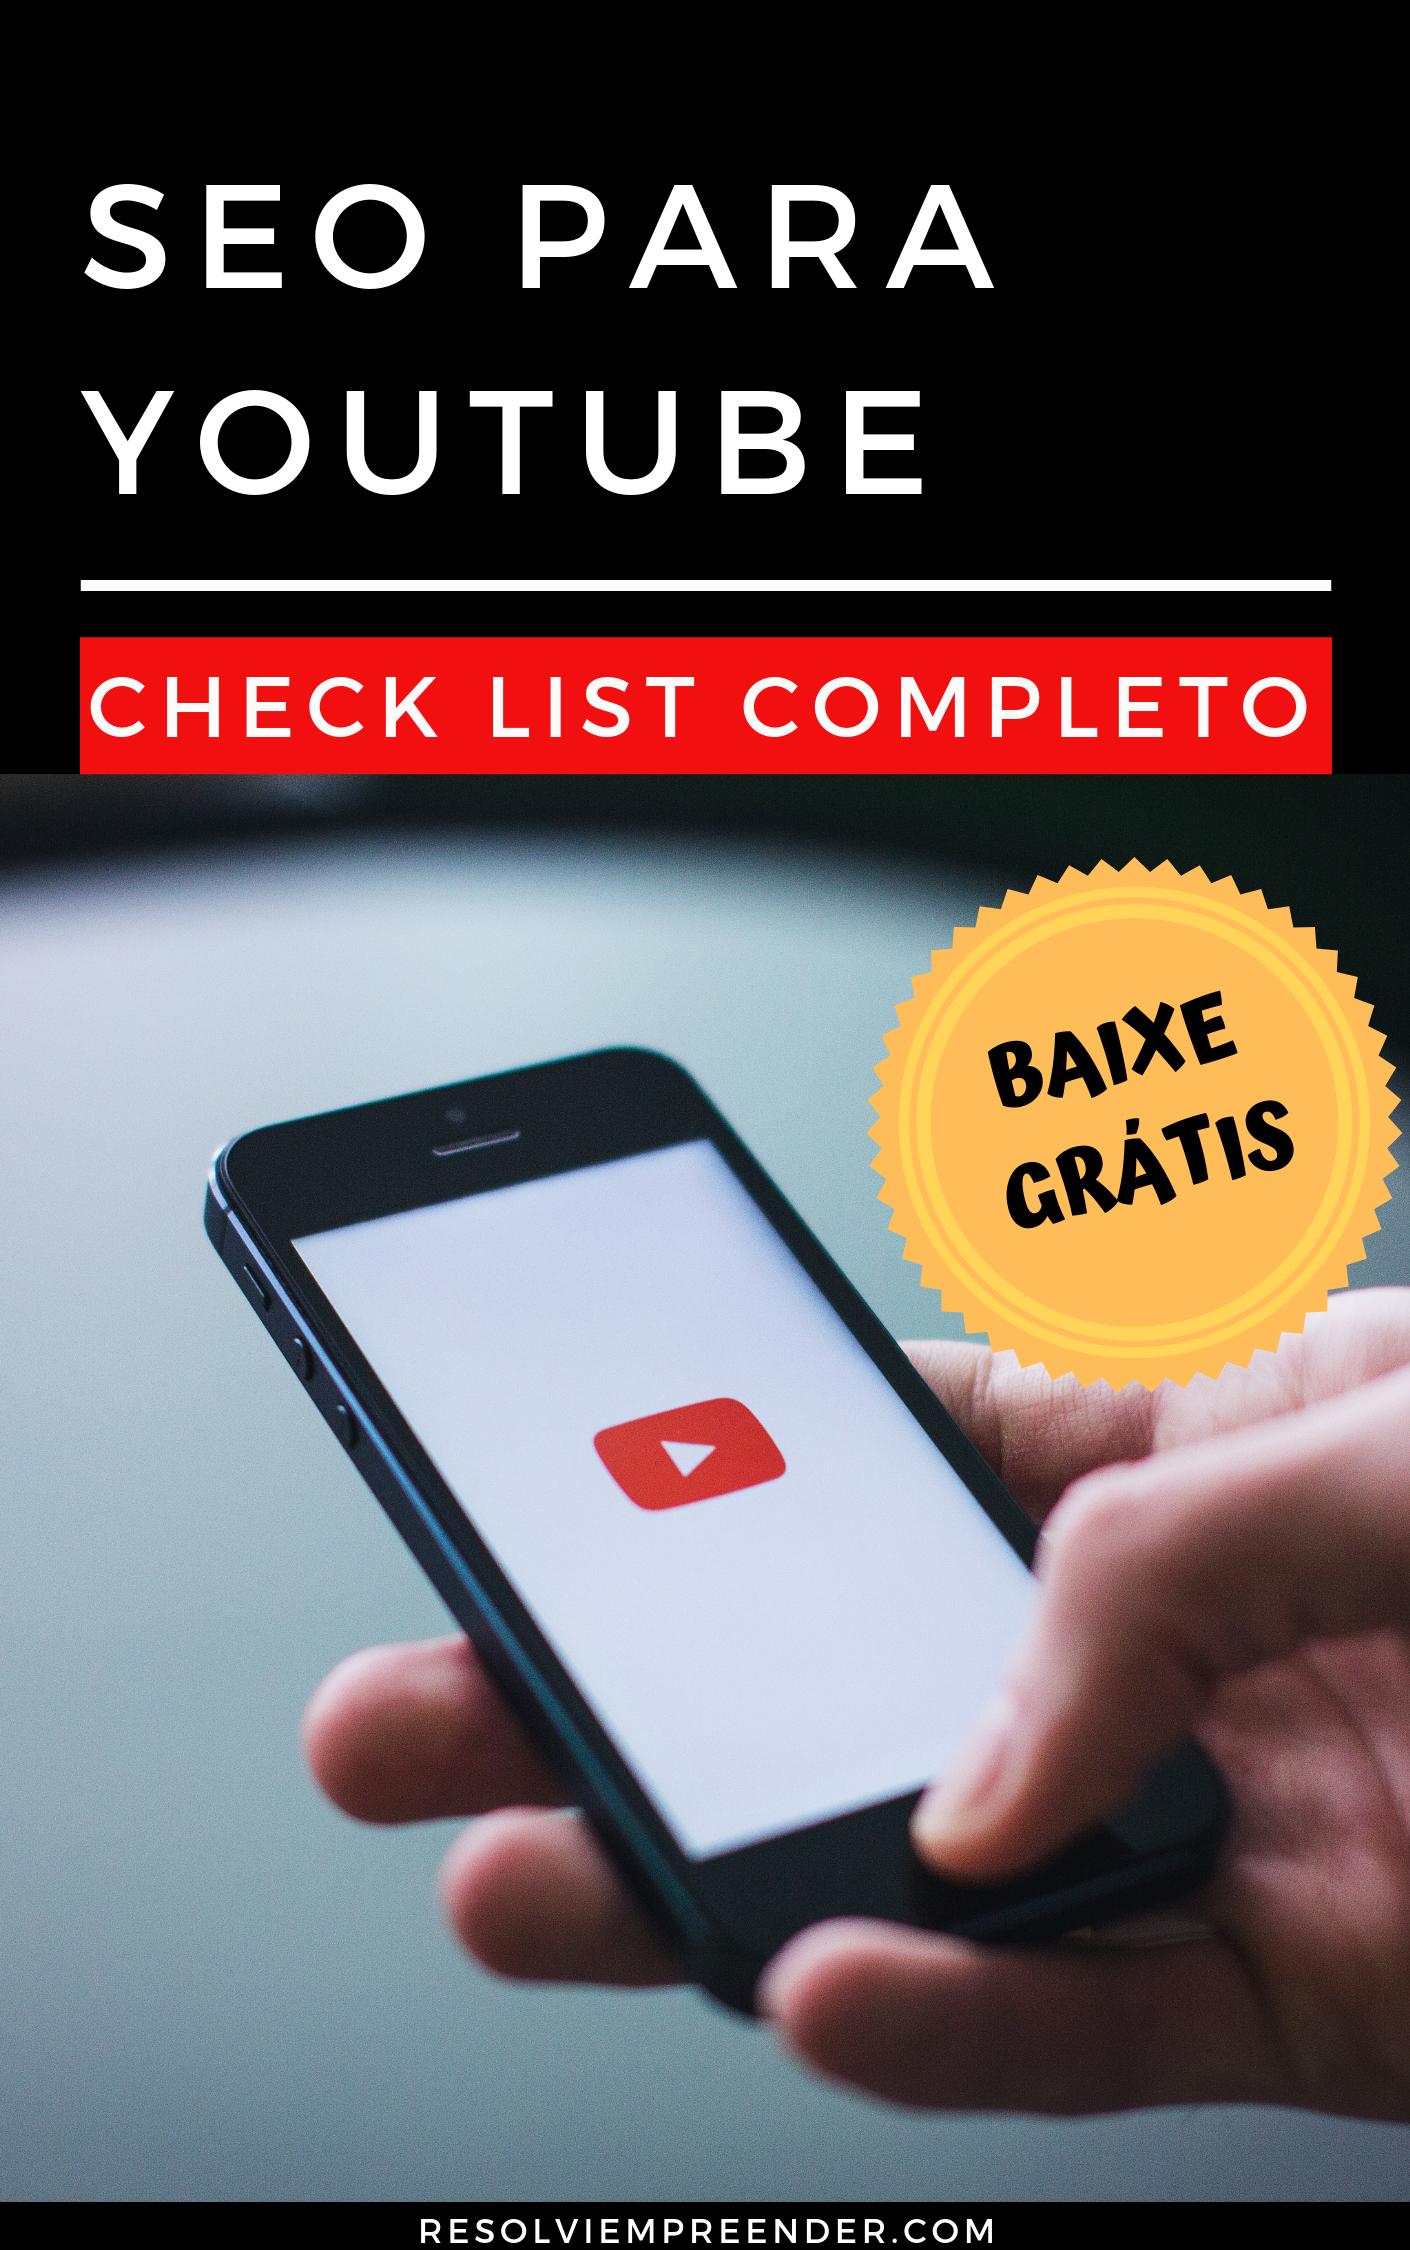 check-list-seo-para-youtube